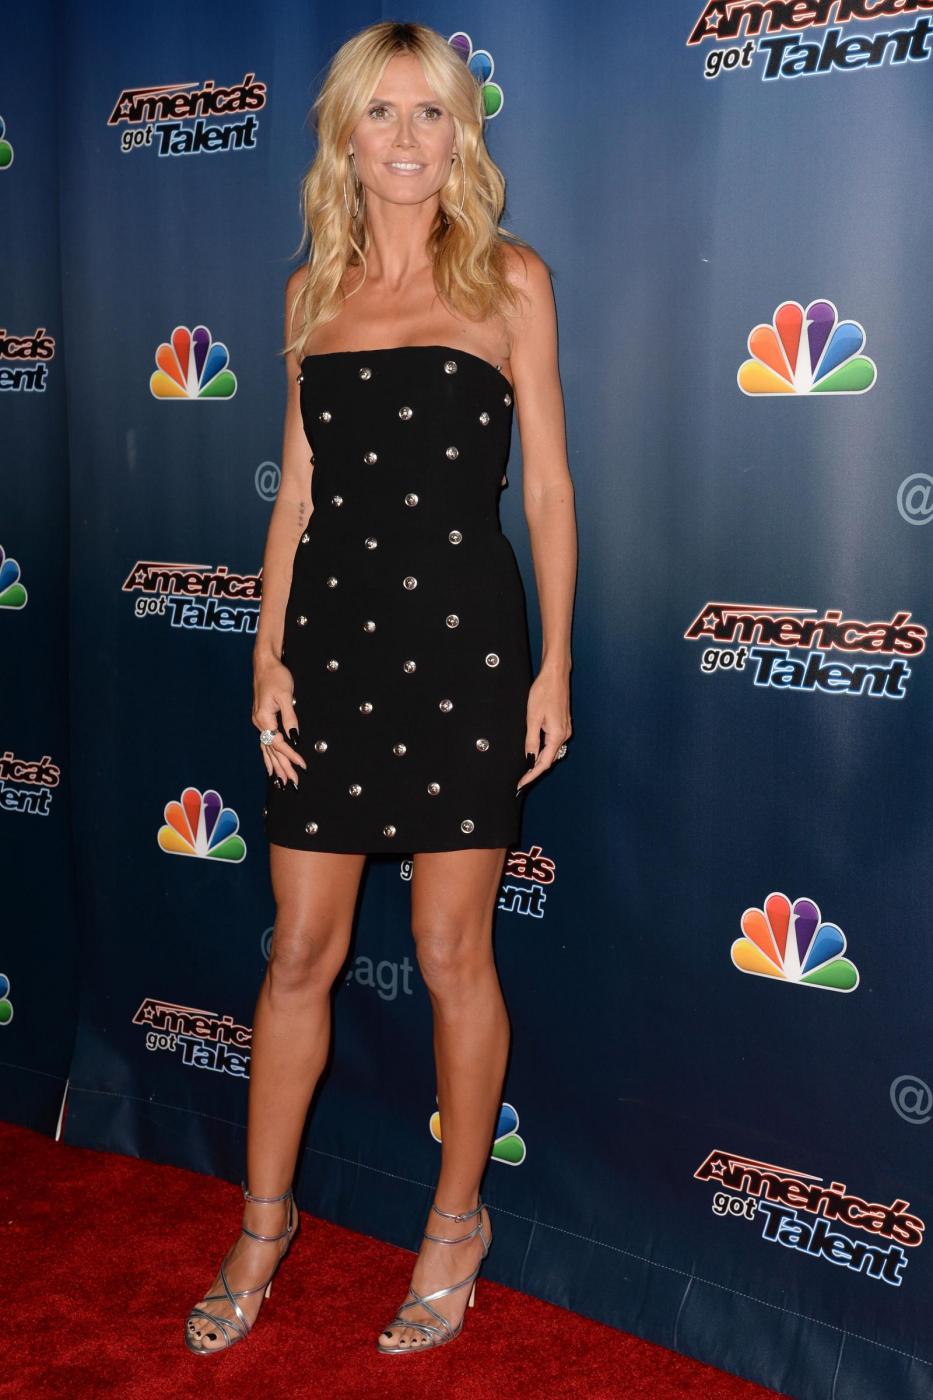 Heidi Klum, mini abito e tacchi per America's Got Talent 5